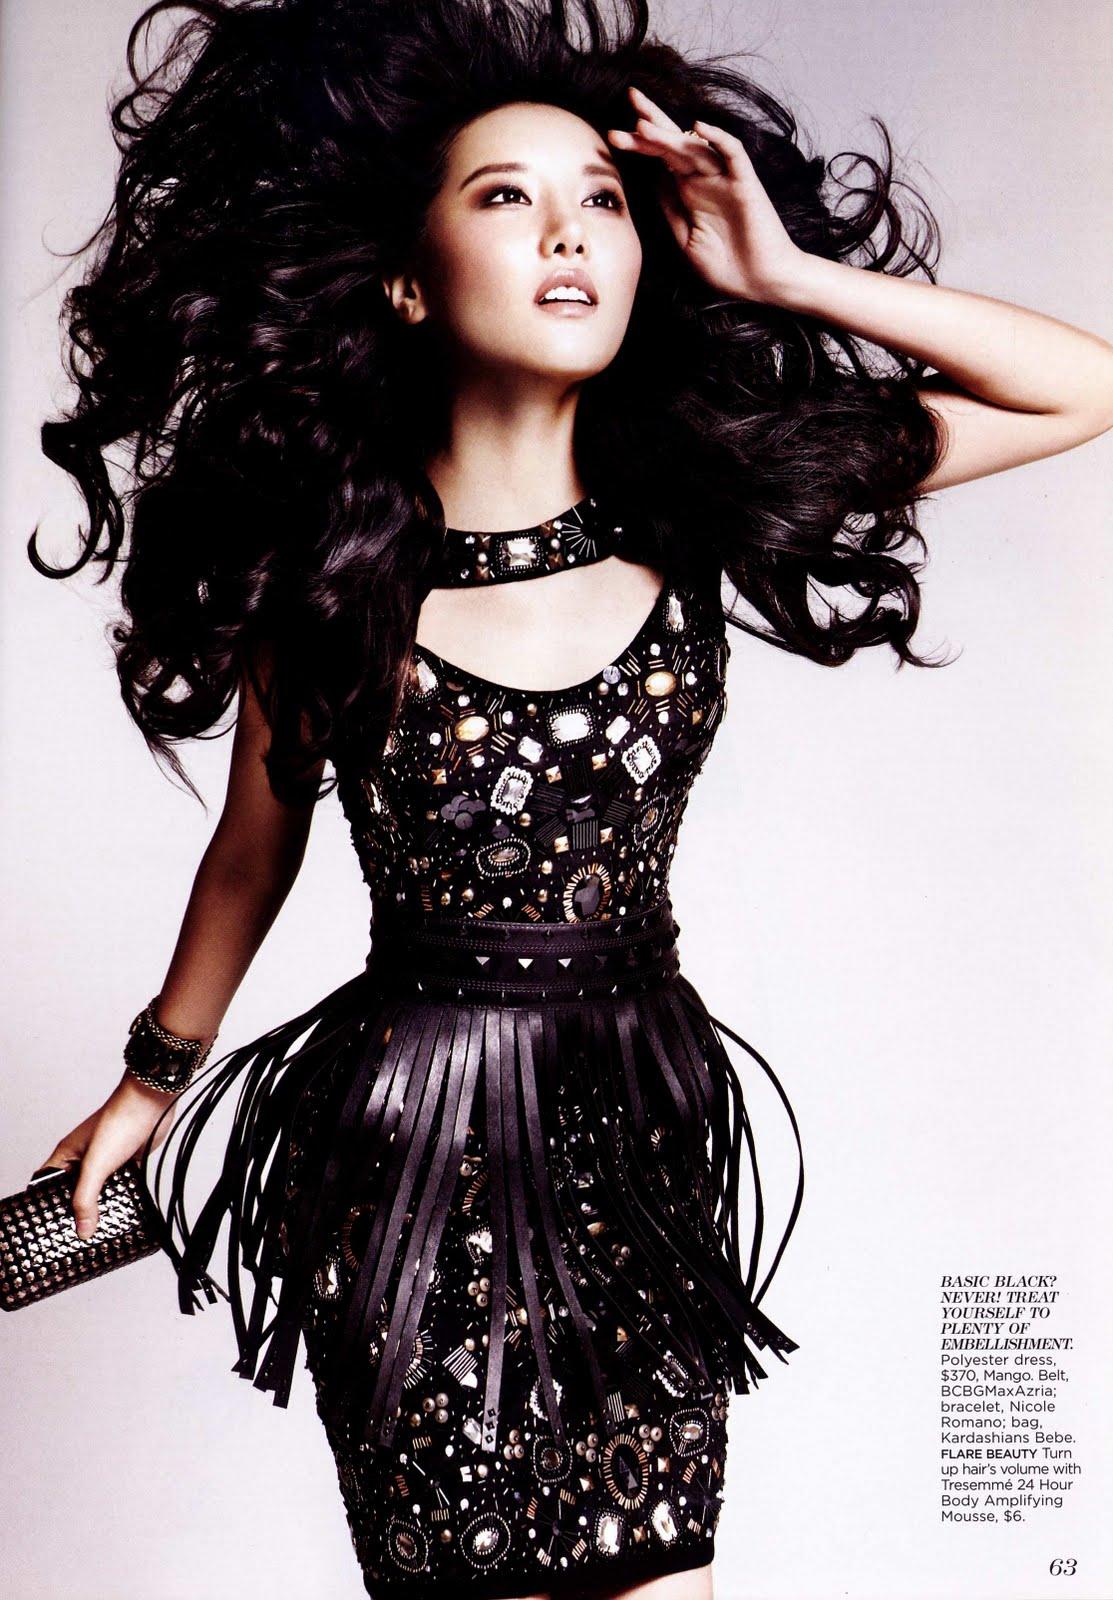 Asian Models Blog Editorial Ming Xi In Vogue China: ASIAN MODELS BLOG: Shiya Zhao In Editorial For (Canada